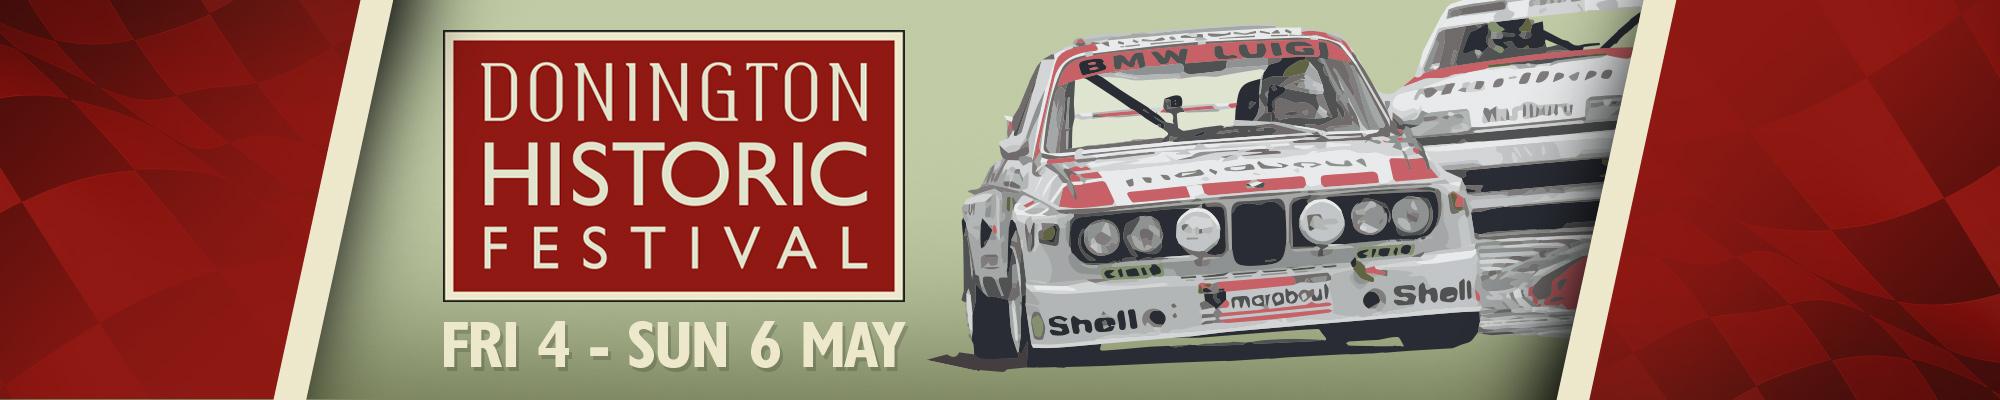 Donington Historic Festival